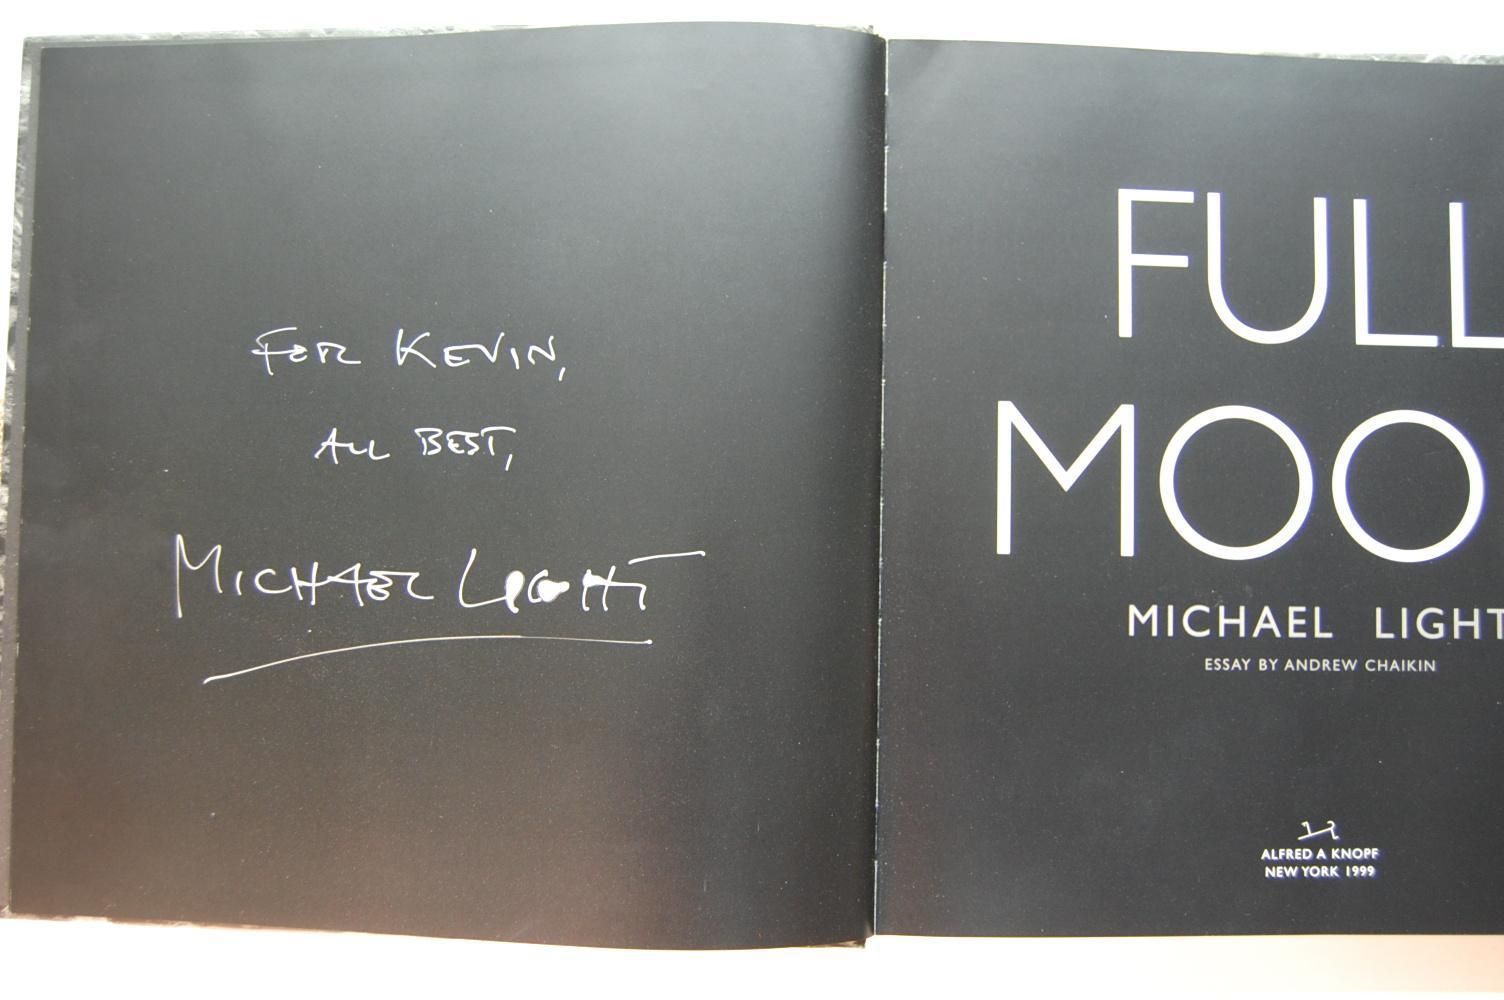 Full new book moon